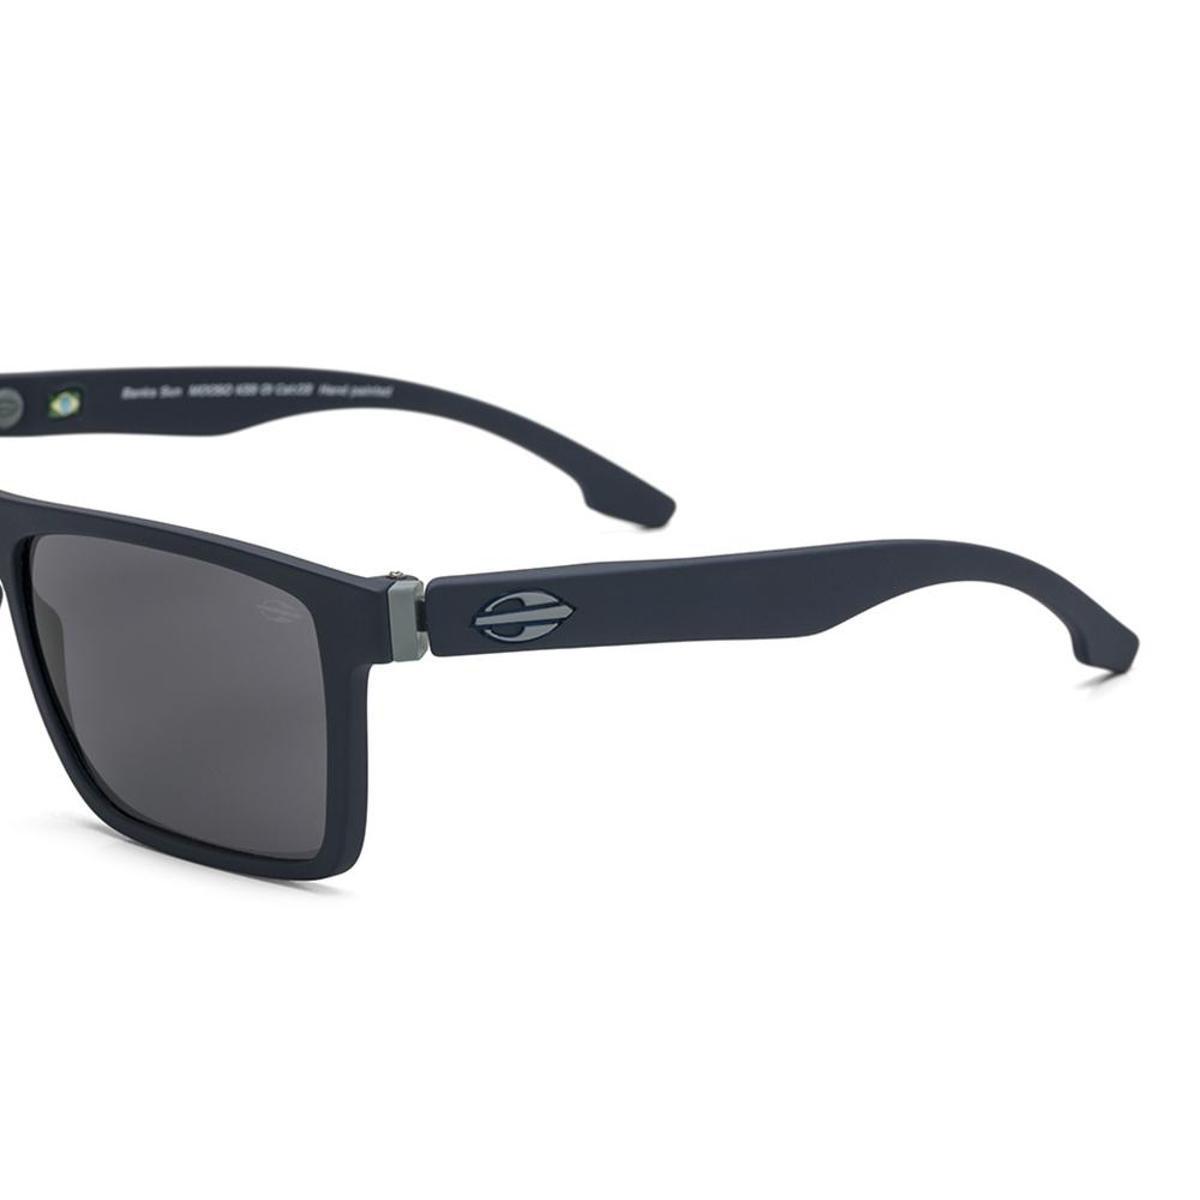 44b2c241f5168 Óculos De Sol Mormaii Banks - Azul - Compre Agora